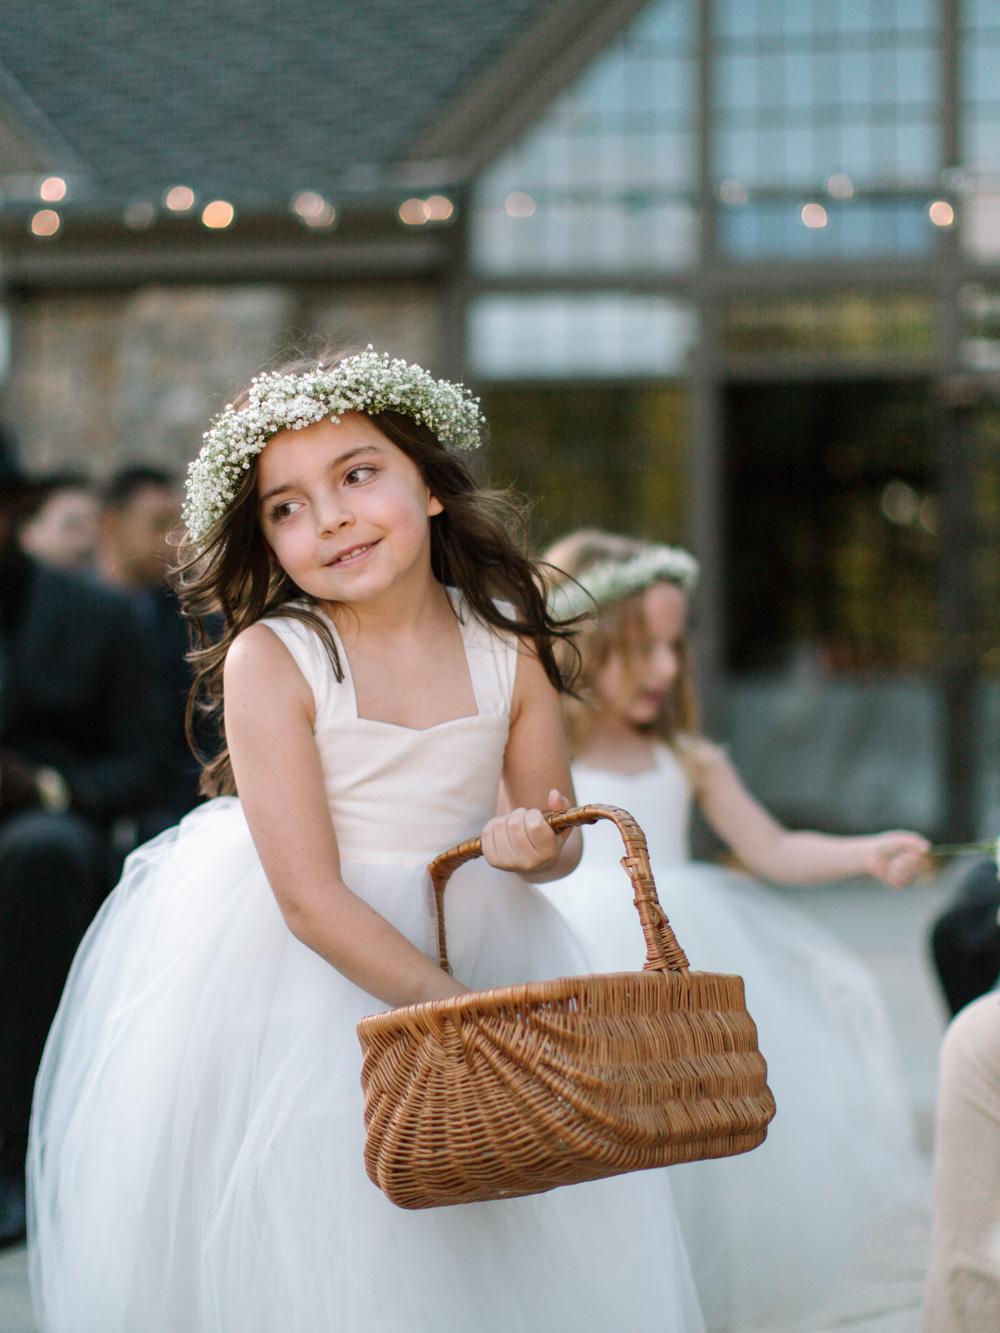 kateweinsteinphoto_korn_wedding-151.jpg